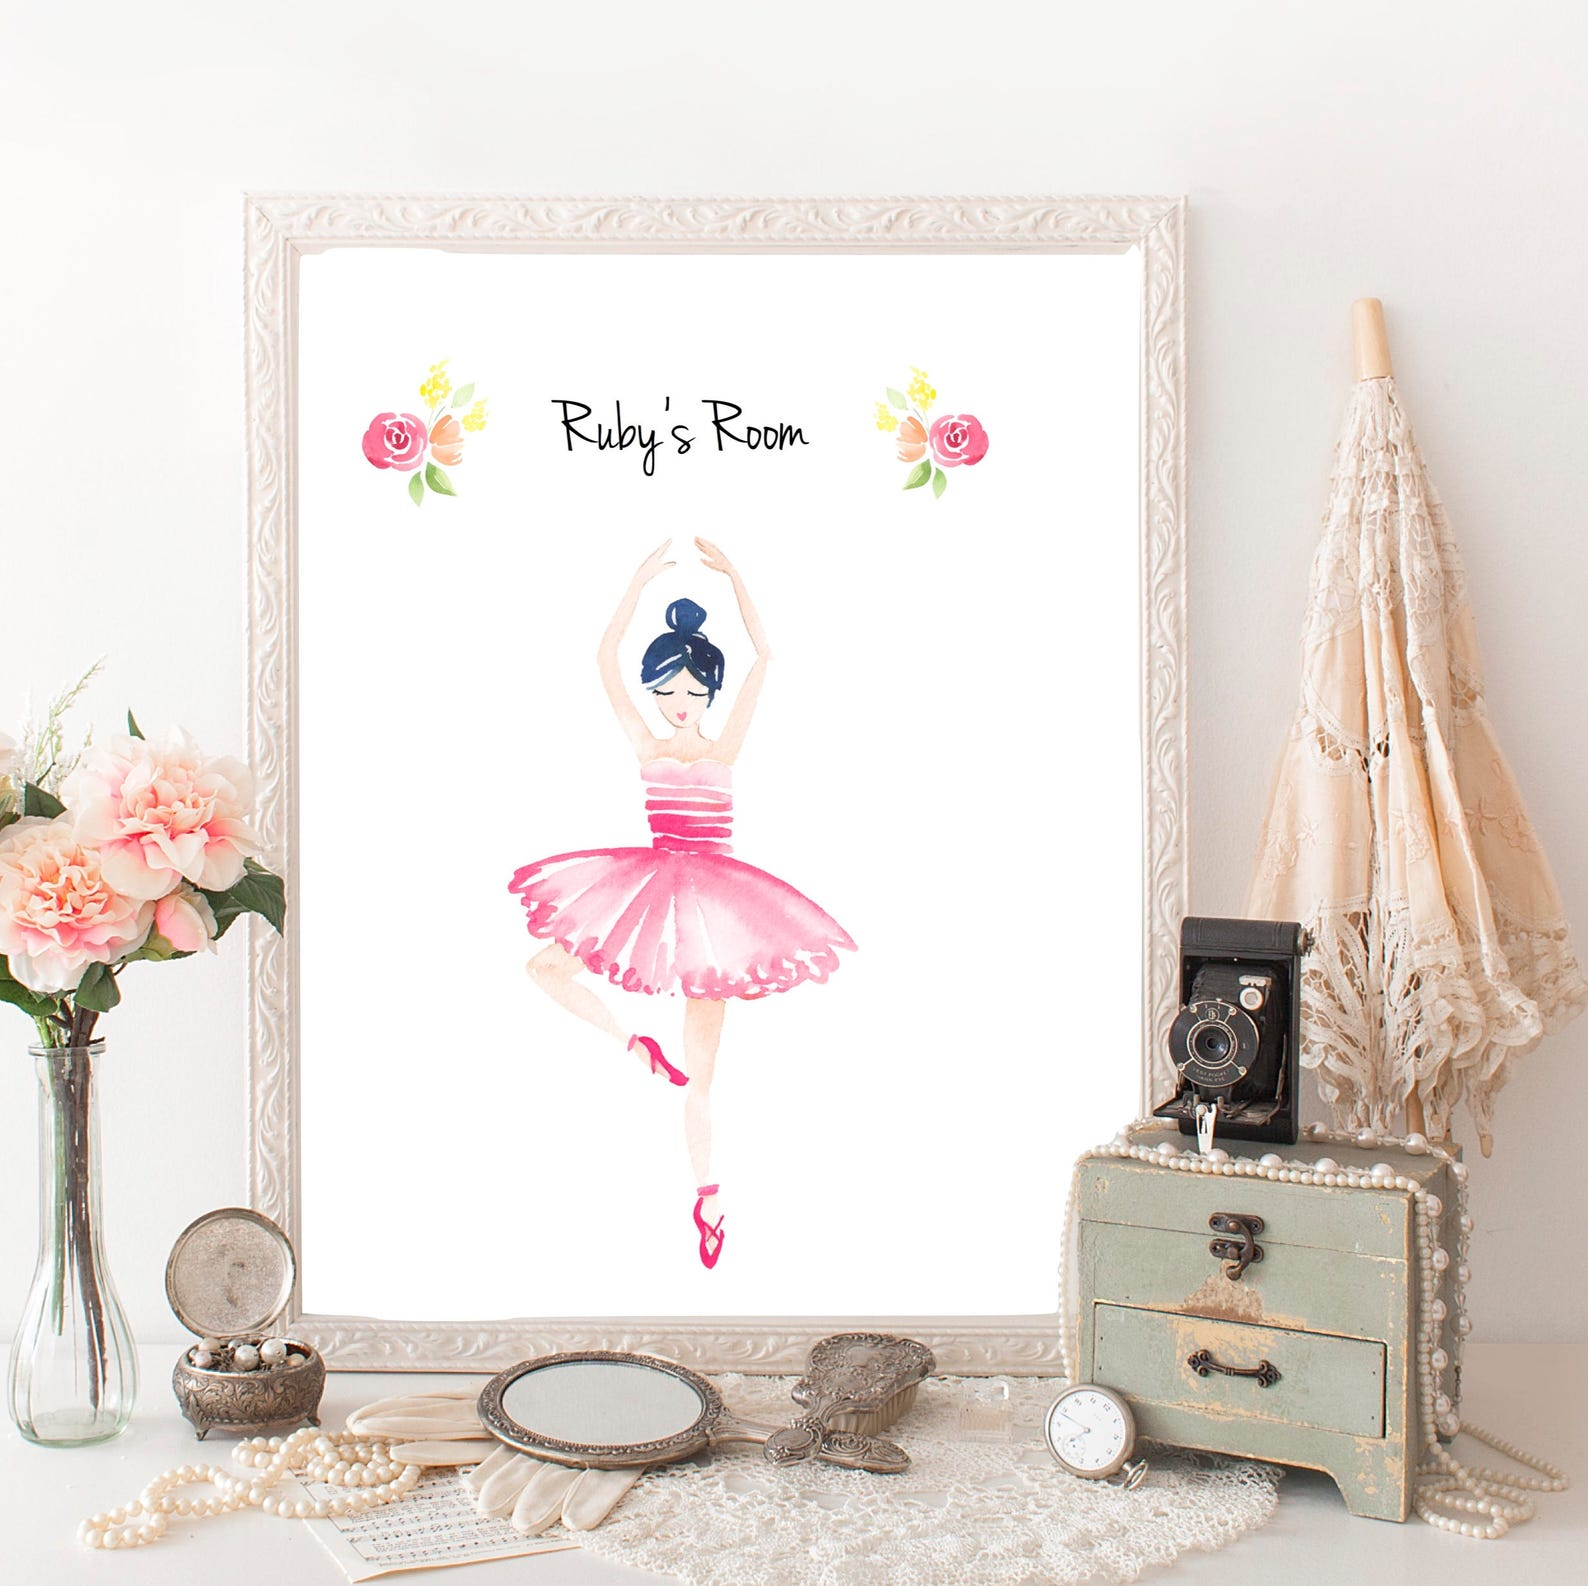 Ballerina Personalized Digital Print Diy Home Decor Wall Art